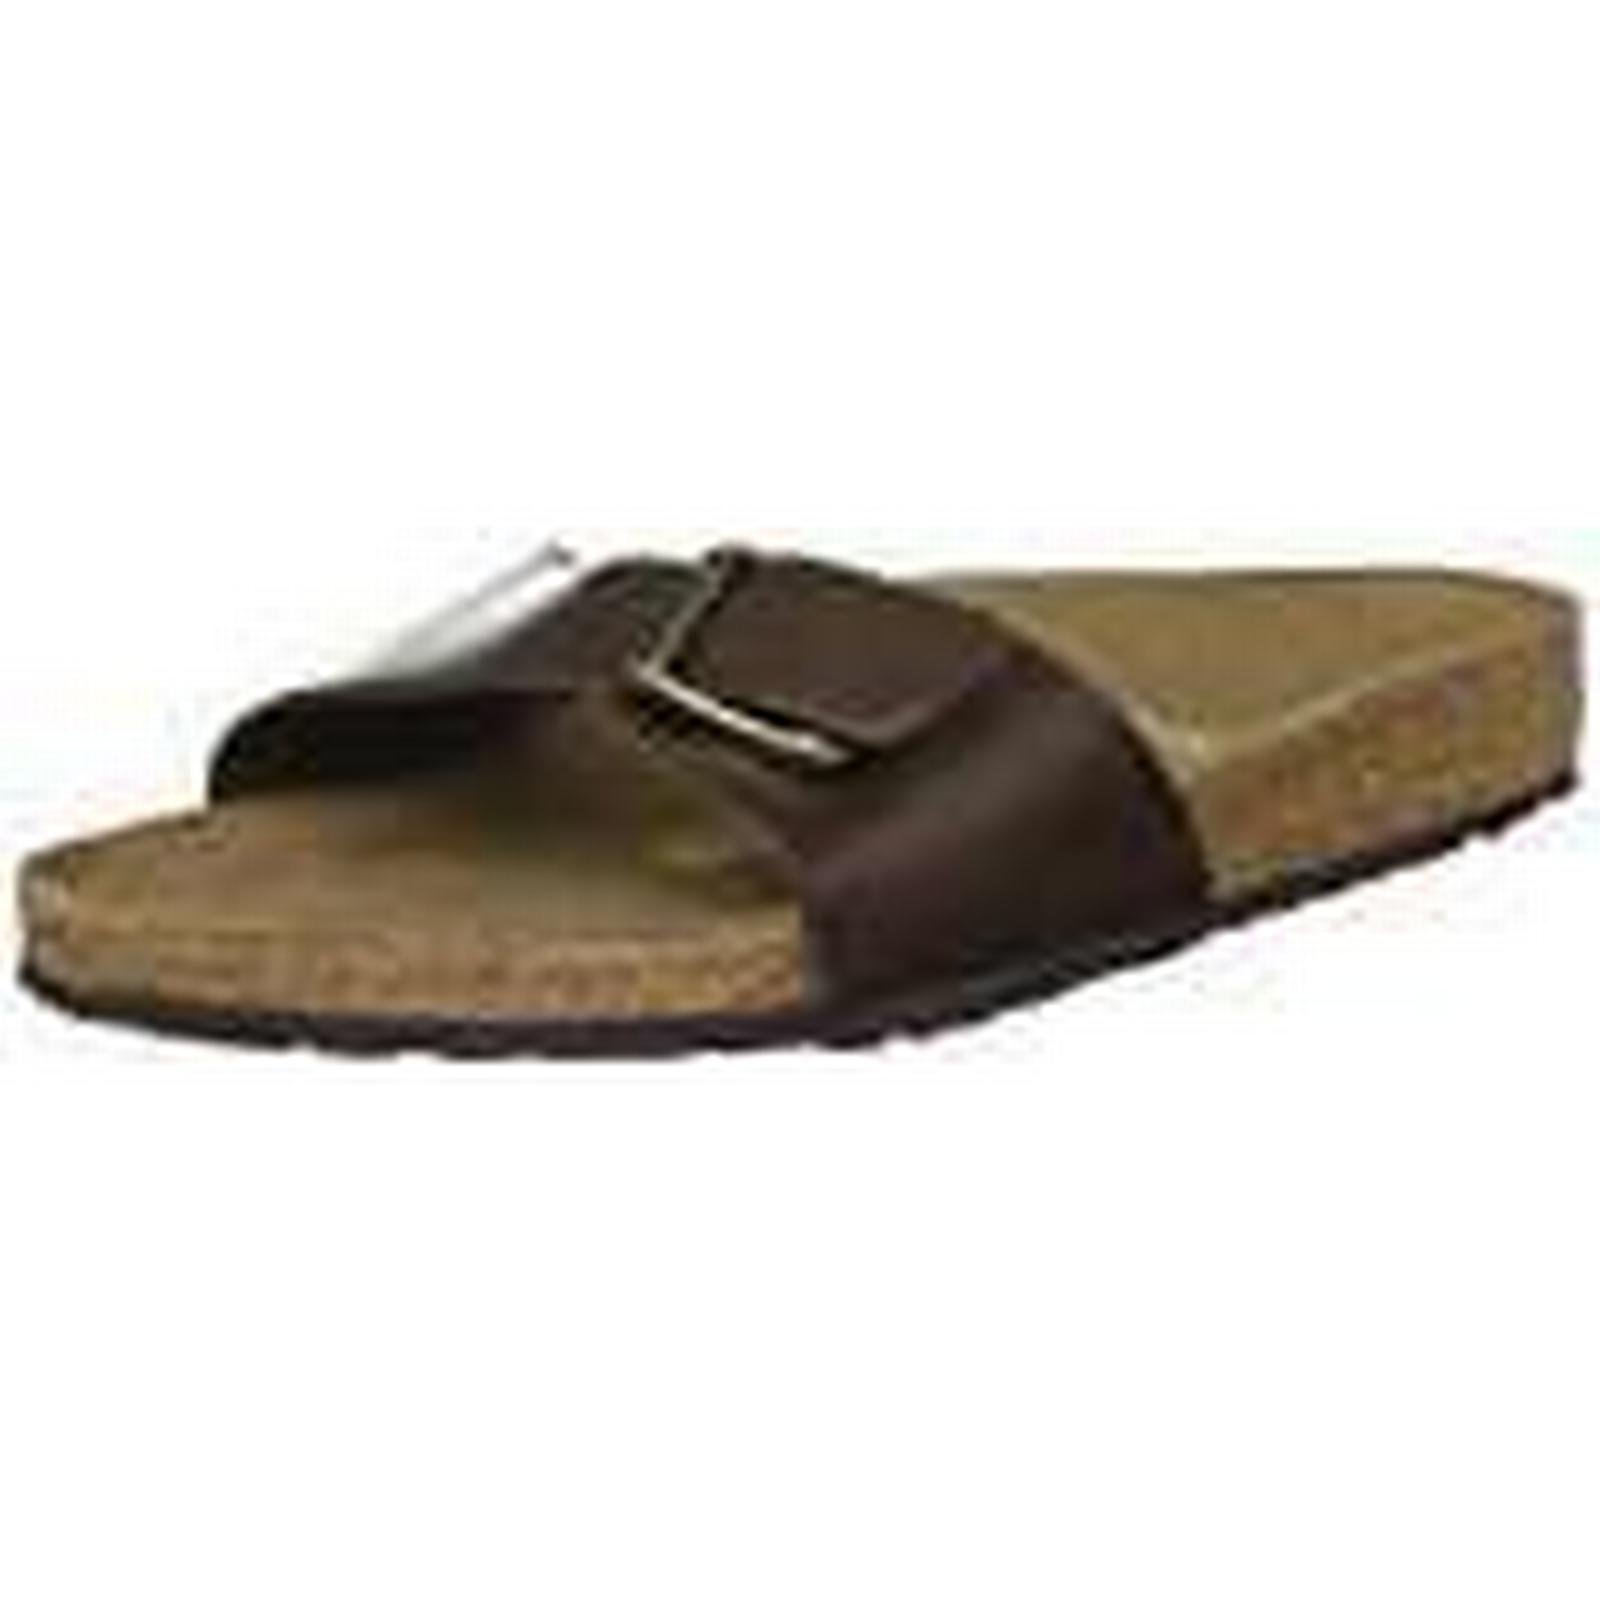 Birkenstock Madrid Unisex-Adults' UK Sandals Toffee - 5.5 UK Unisex-Adults' 06c6a0